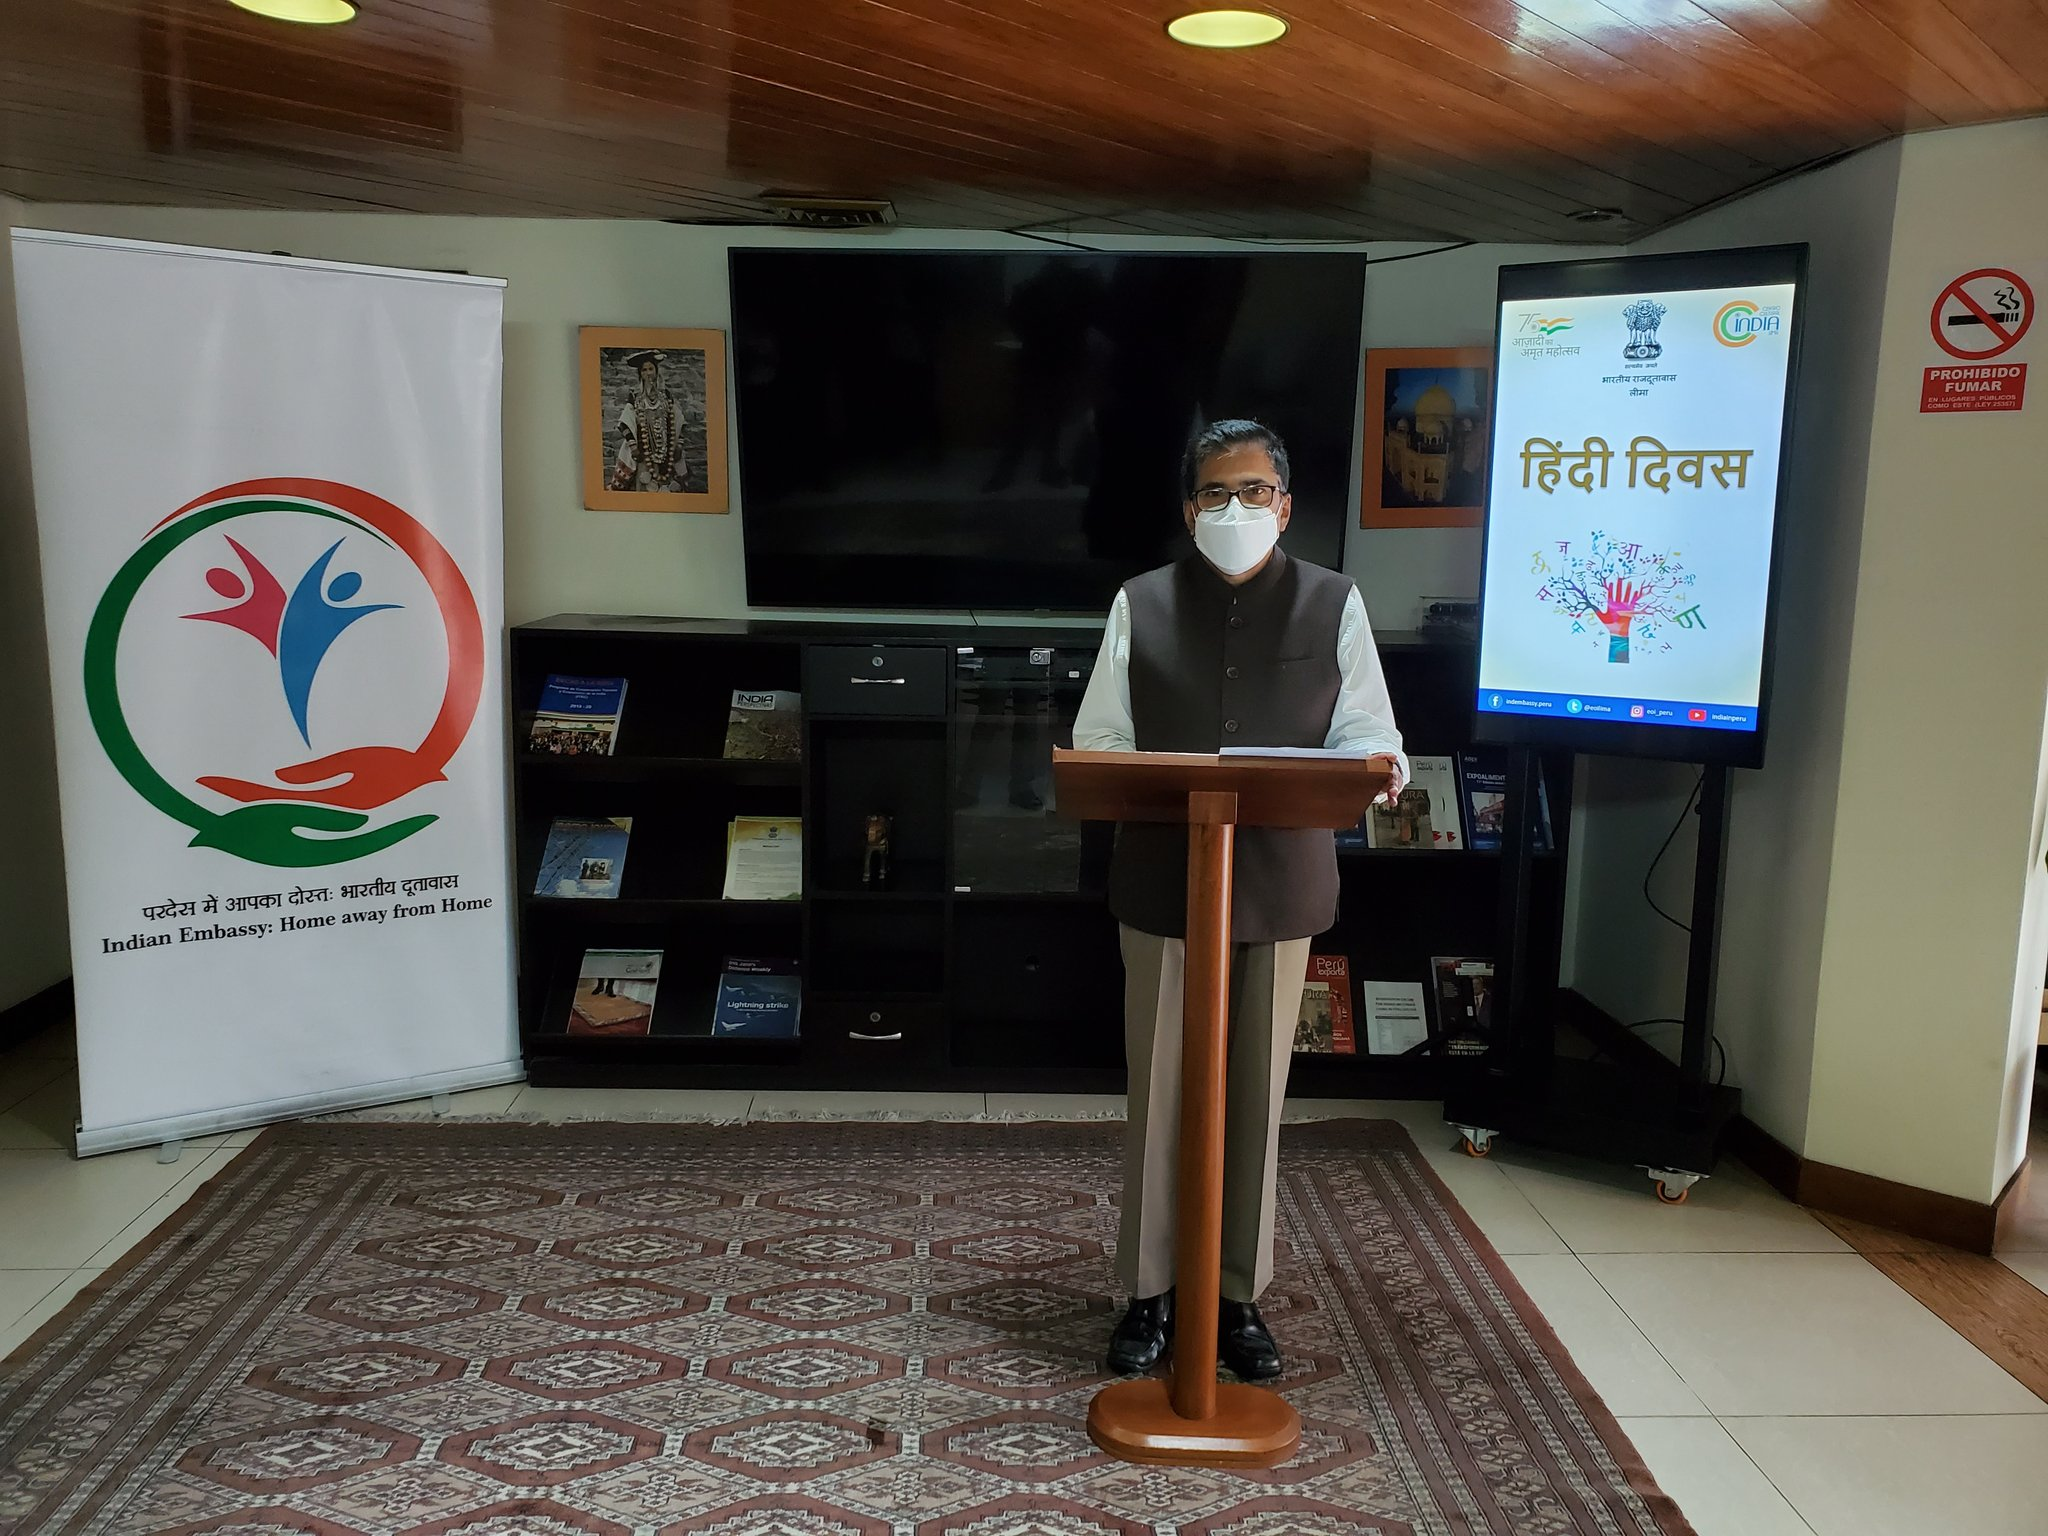 Celebration of Hindi Diwas in Embassy of India, Lima on 14 September 2021